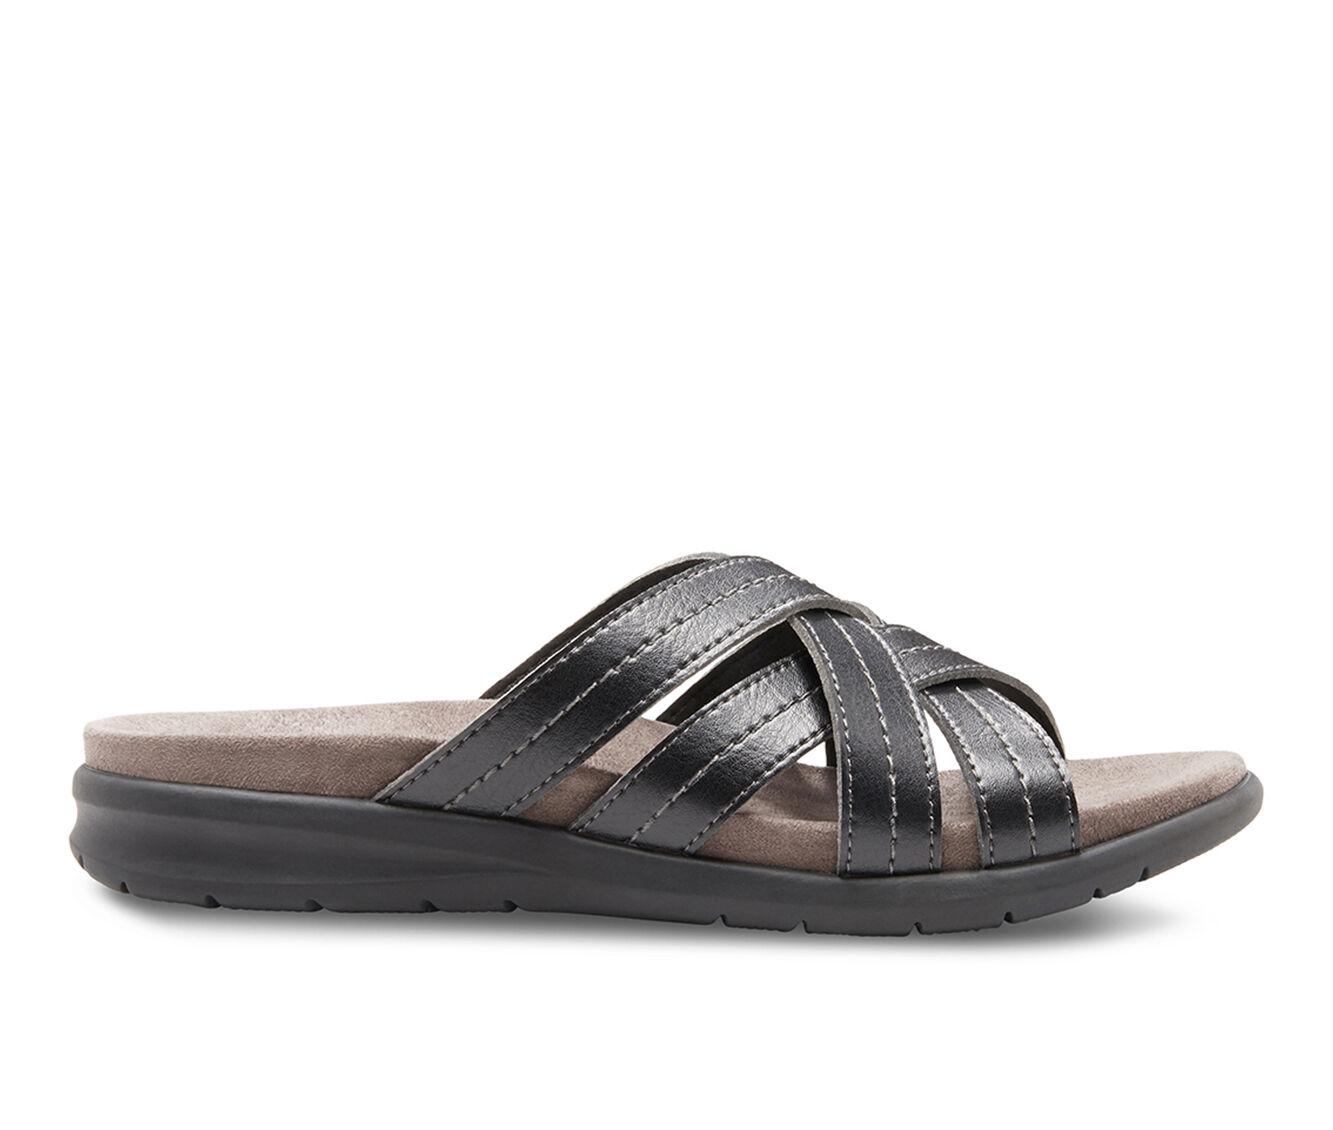 uk shoes_kd6667